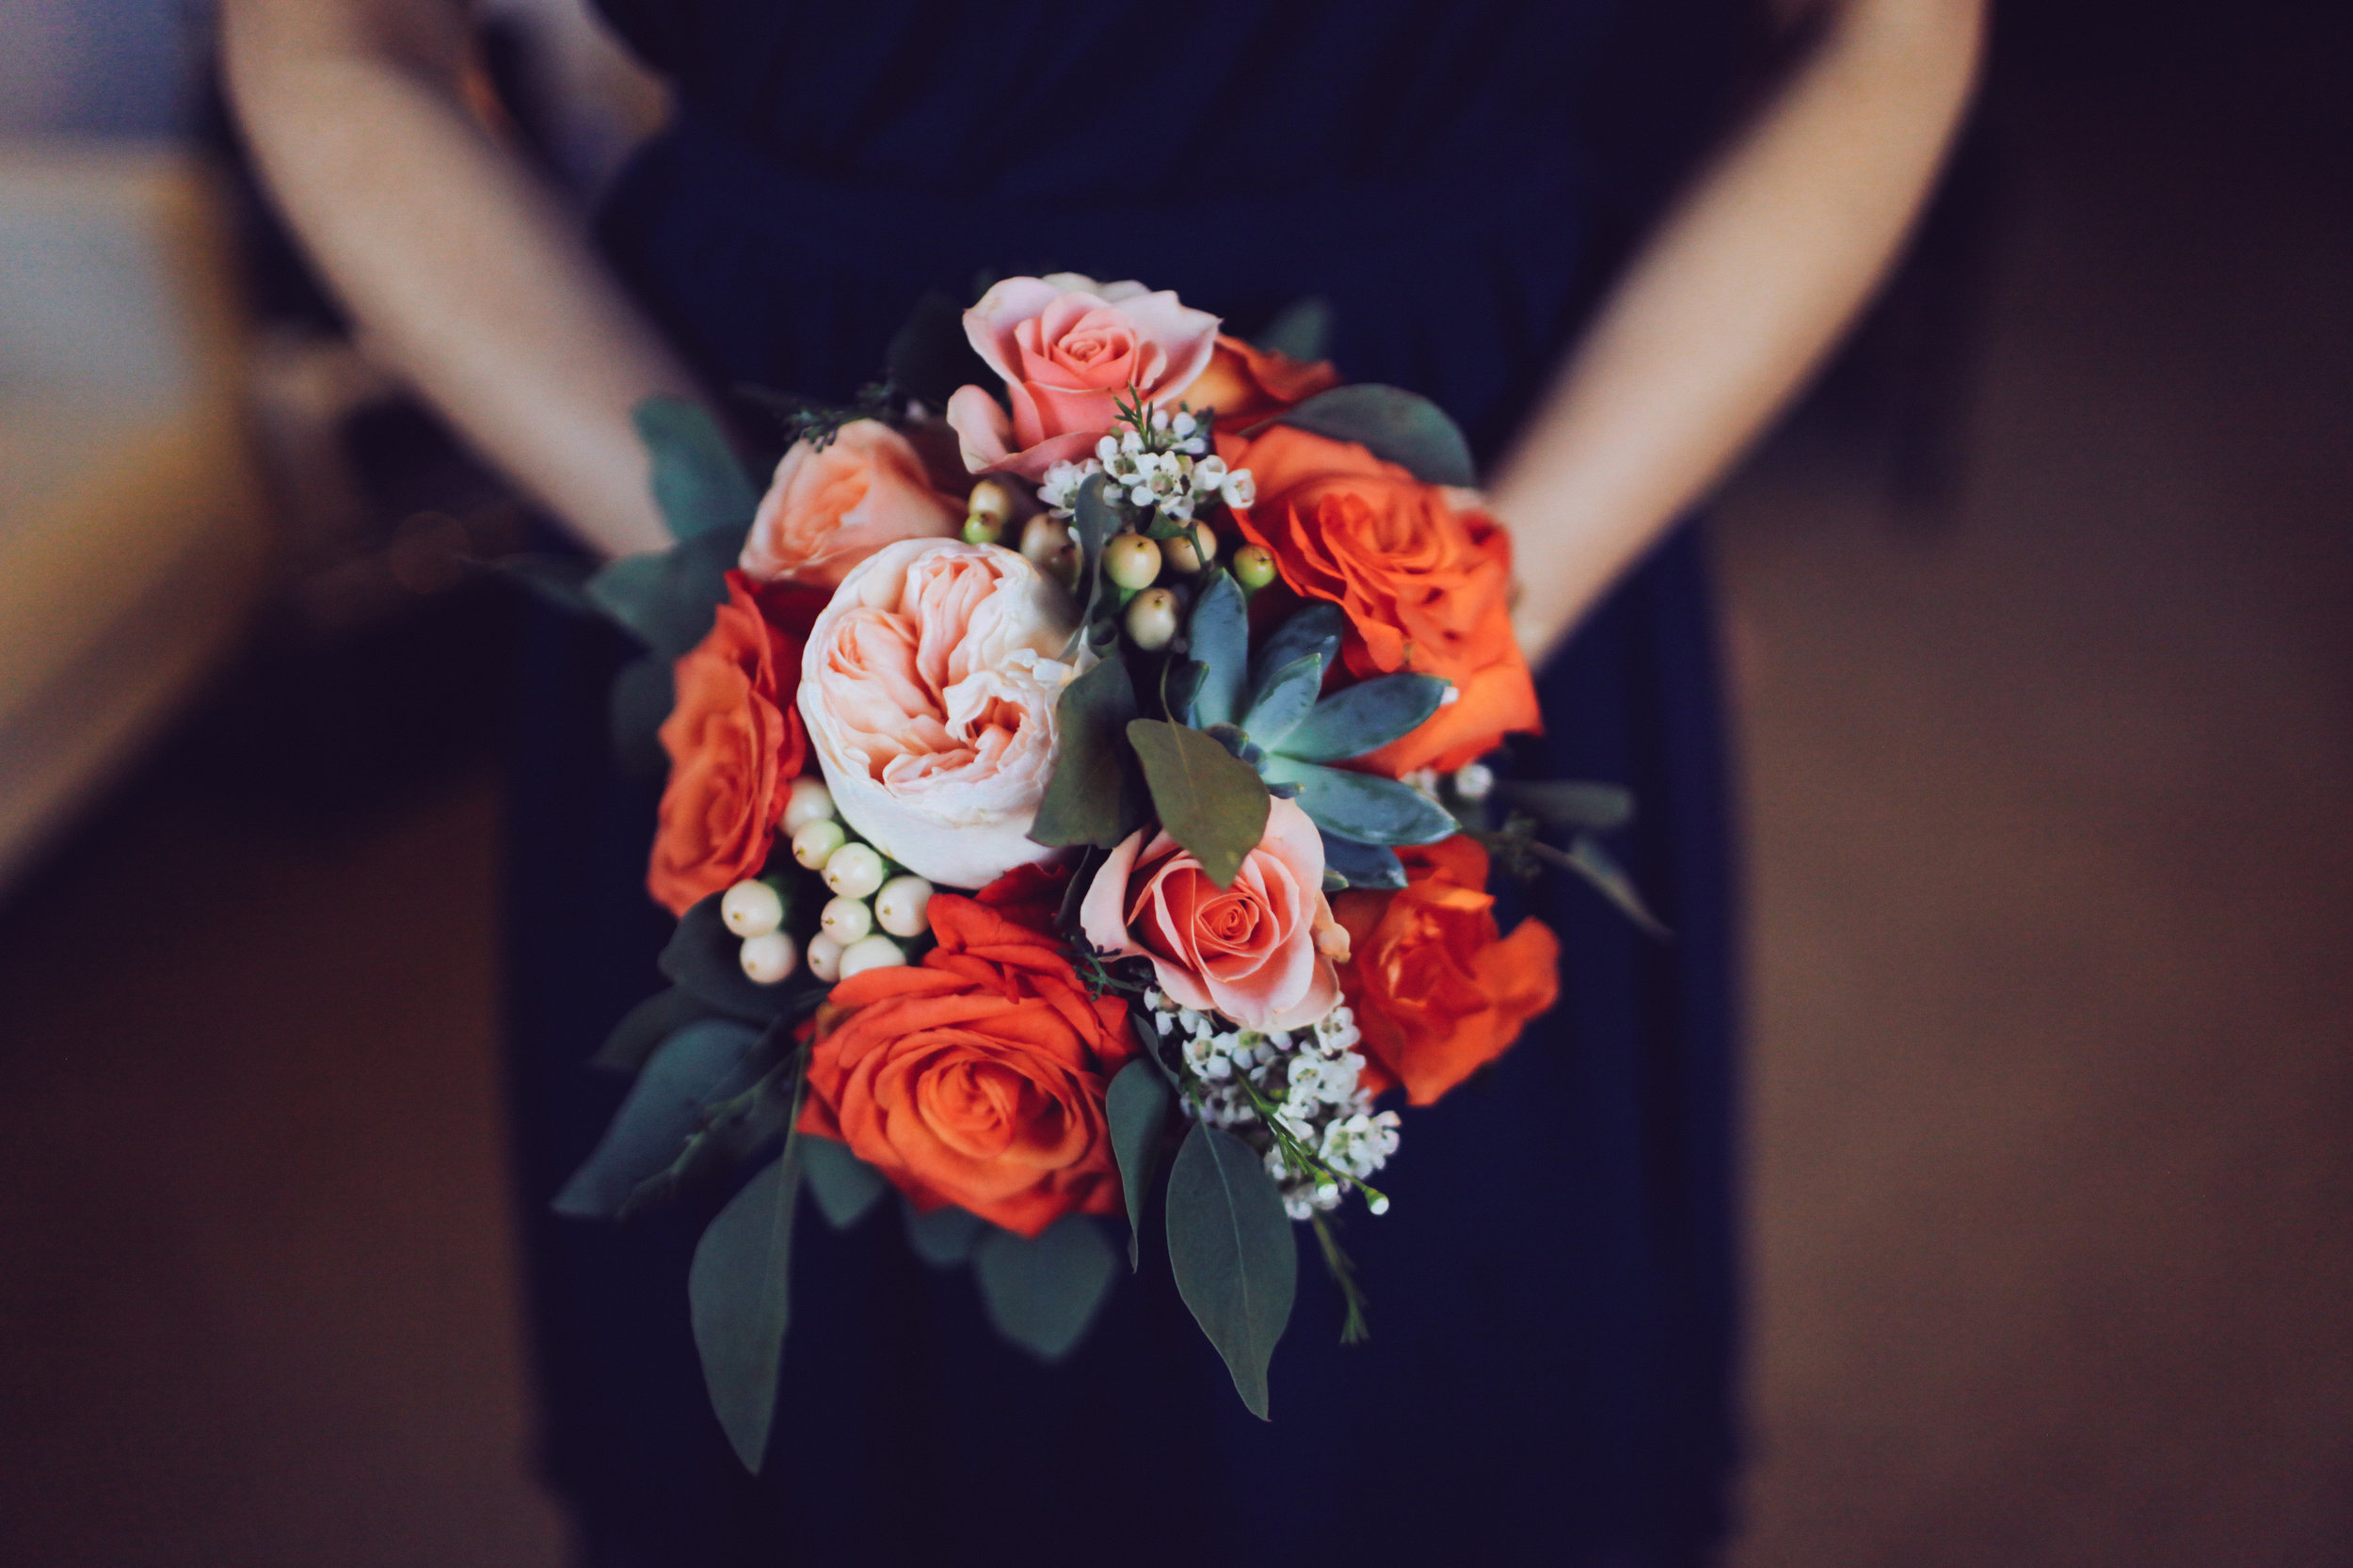 Coral, Salmon, and Peach Bridesmaid Bouquet